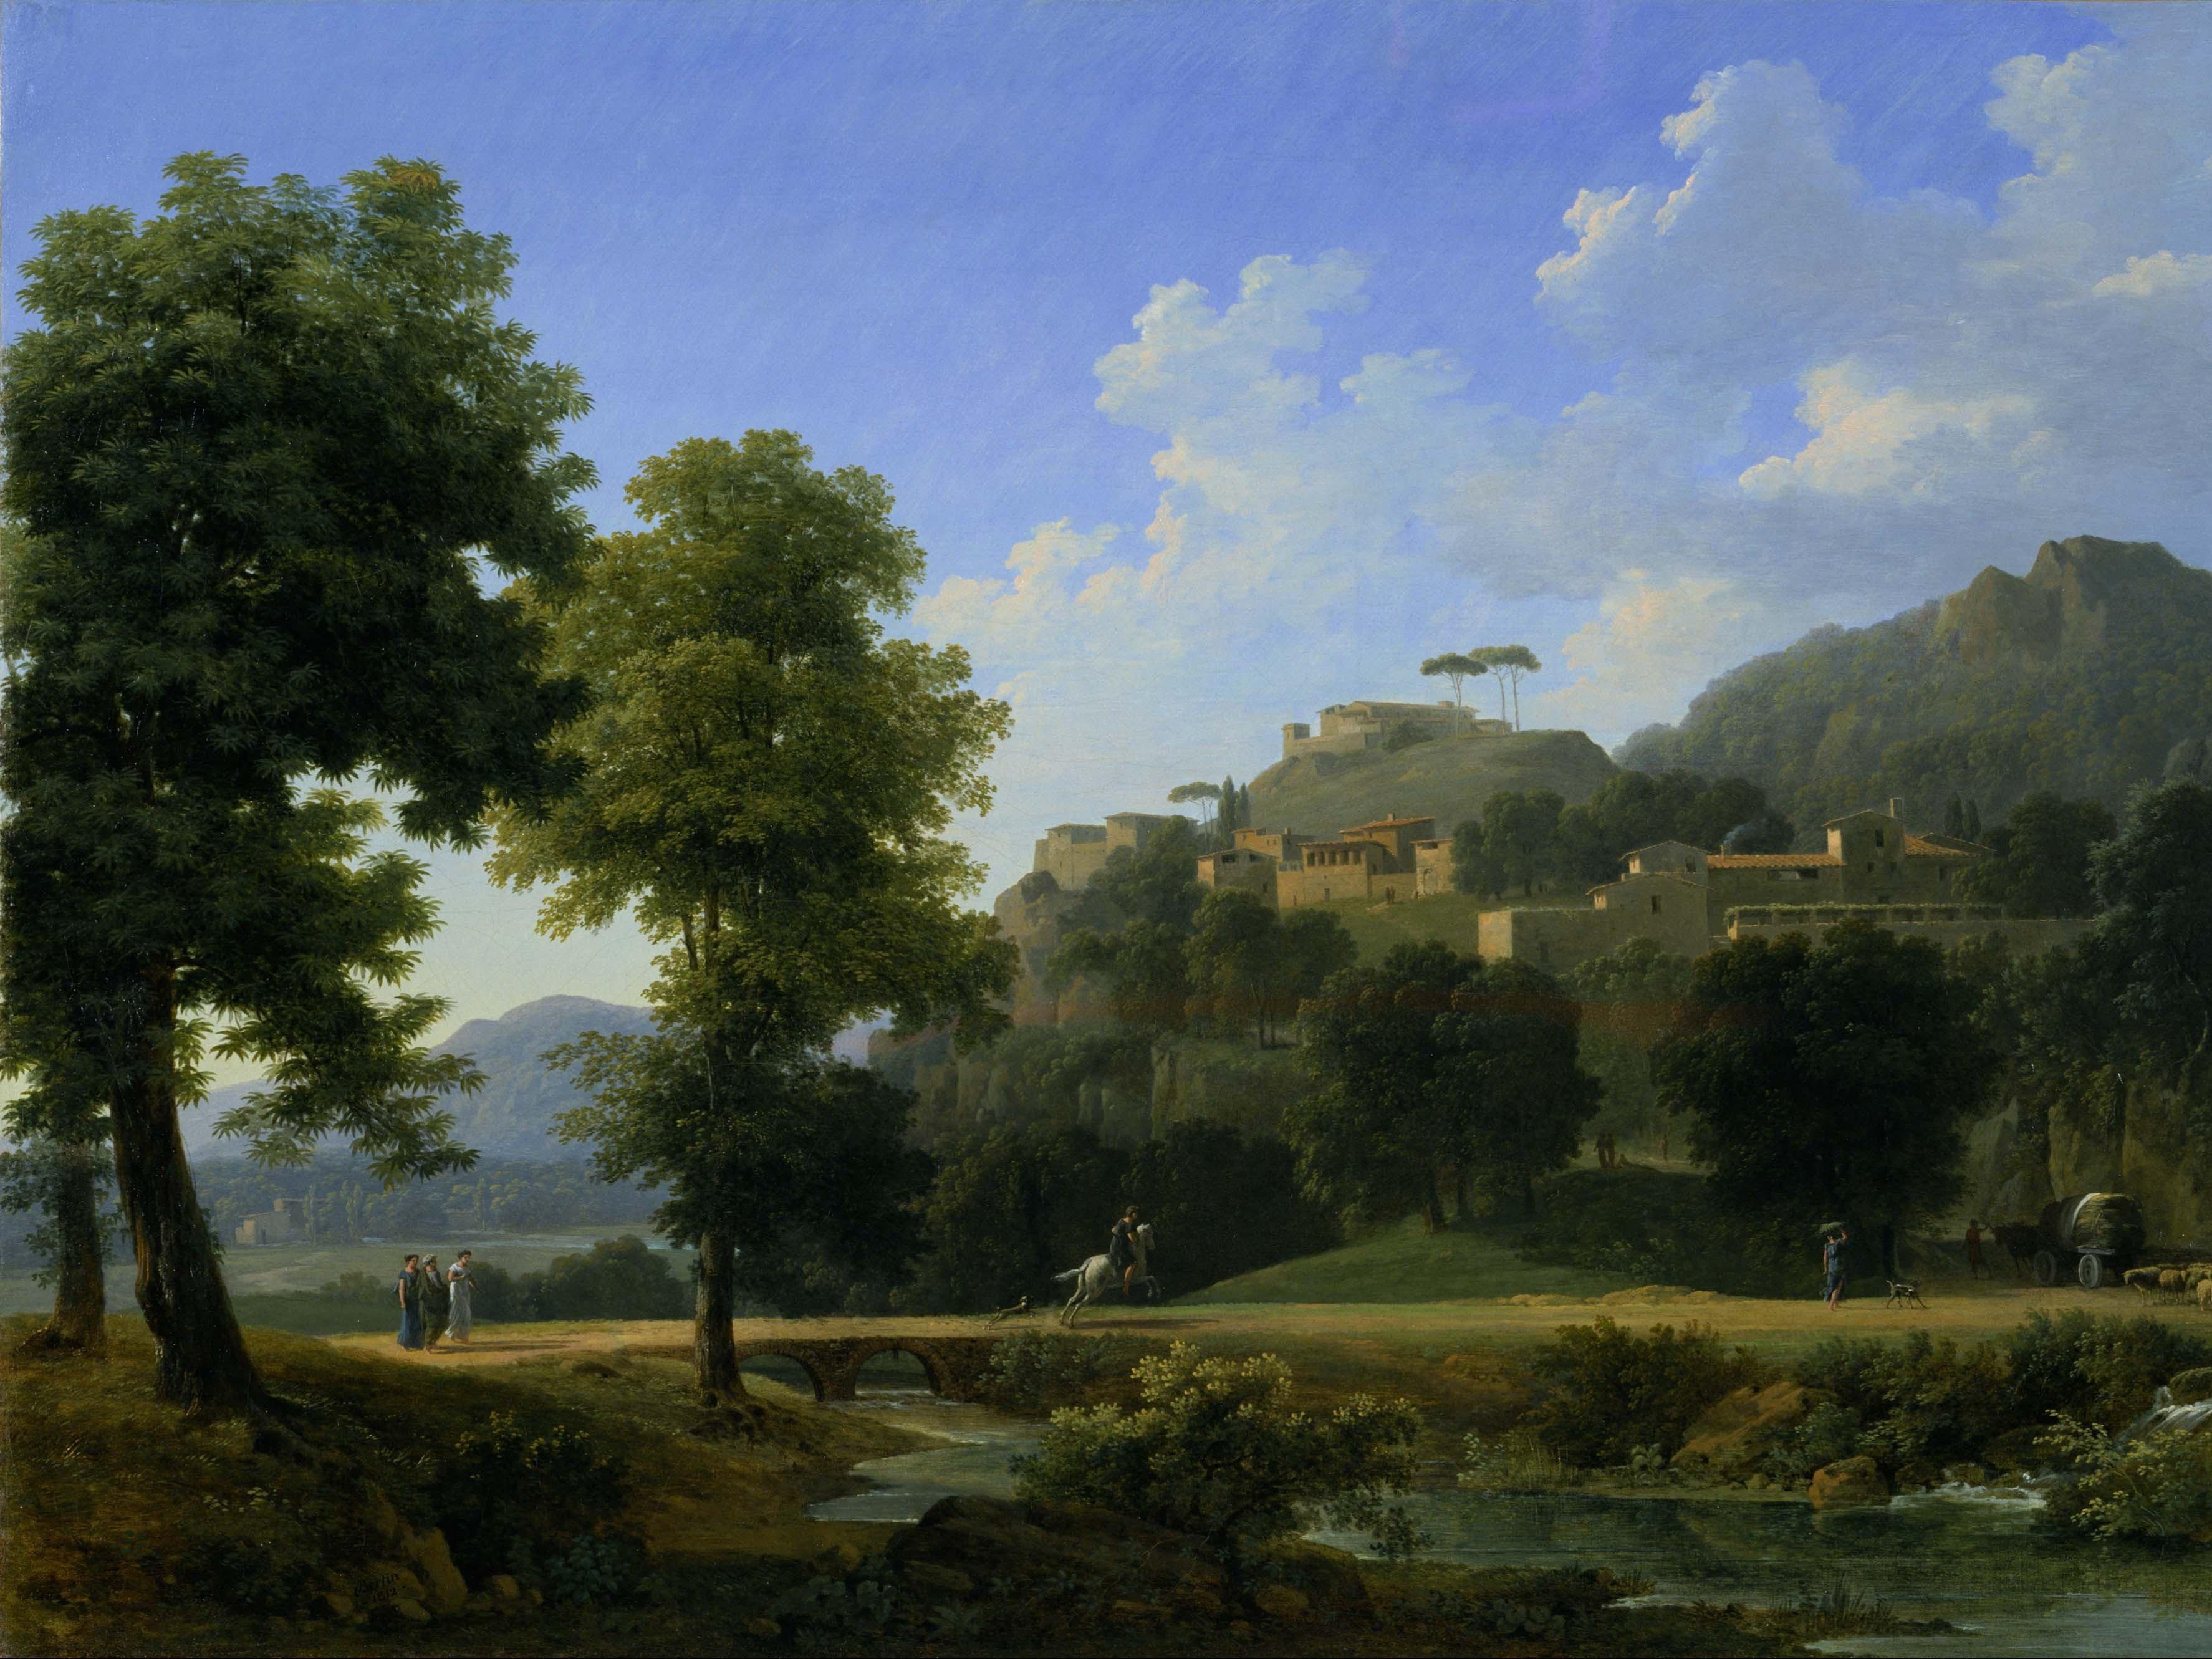 Jean-Victor Bertin: Landscape